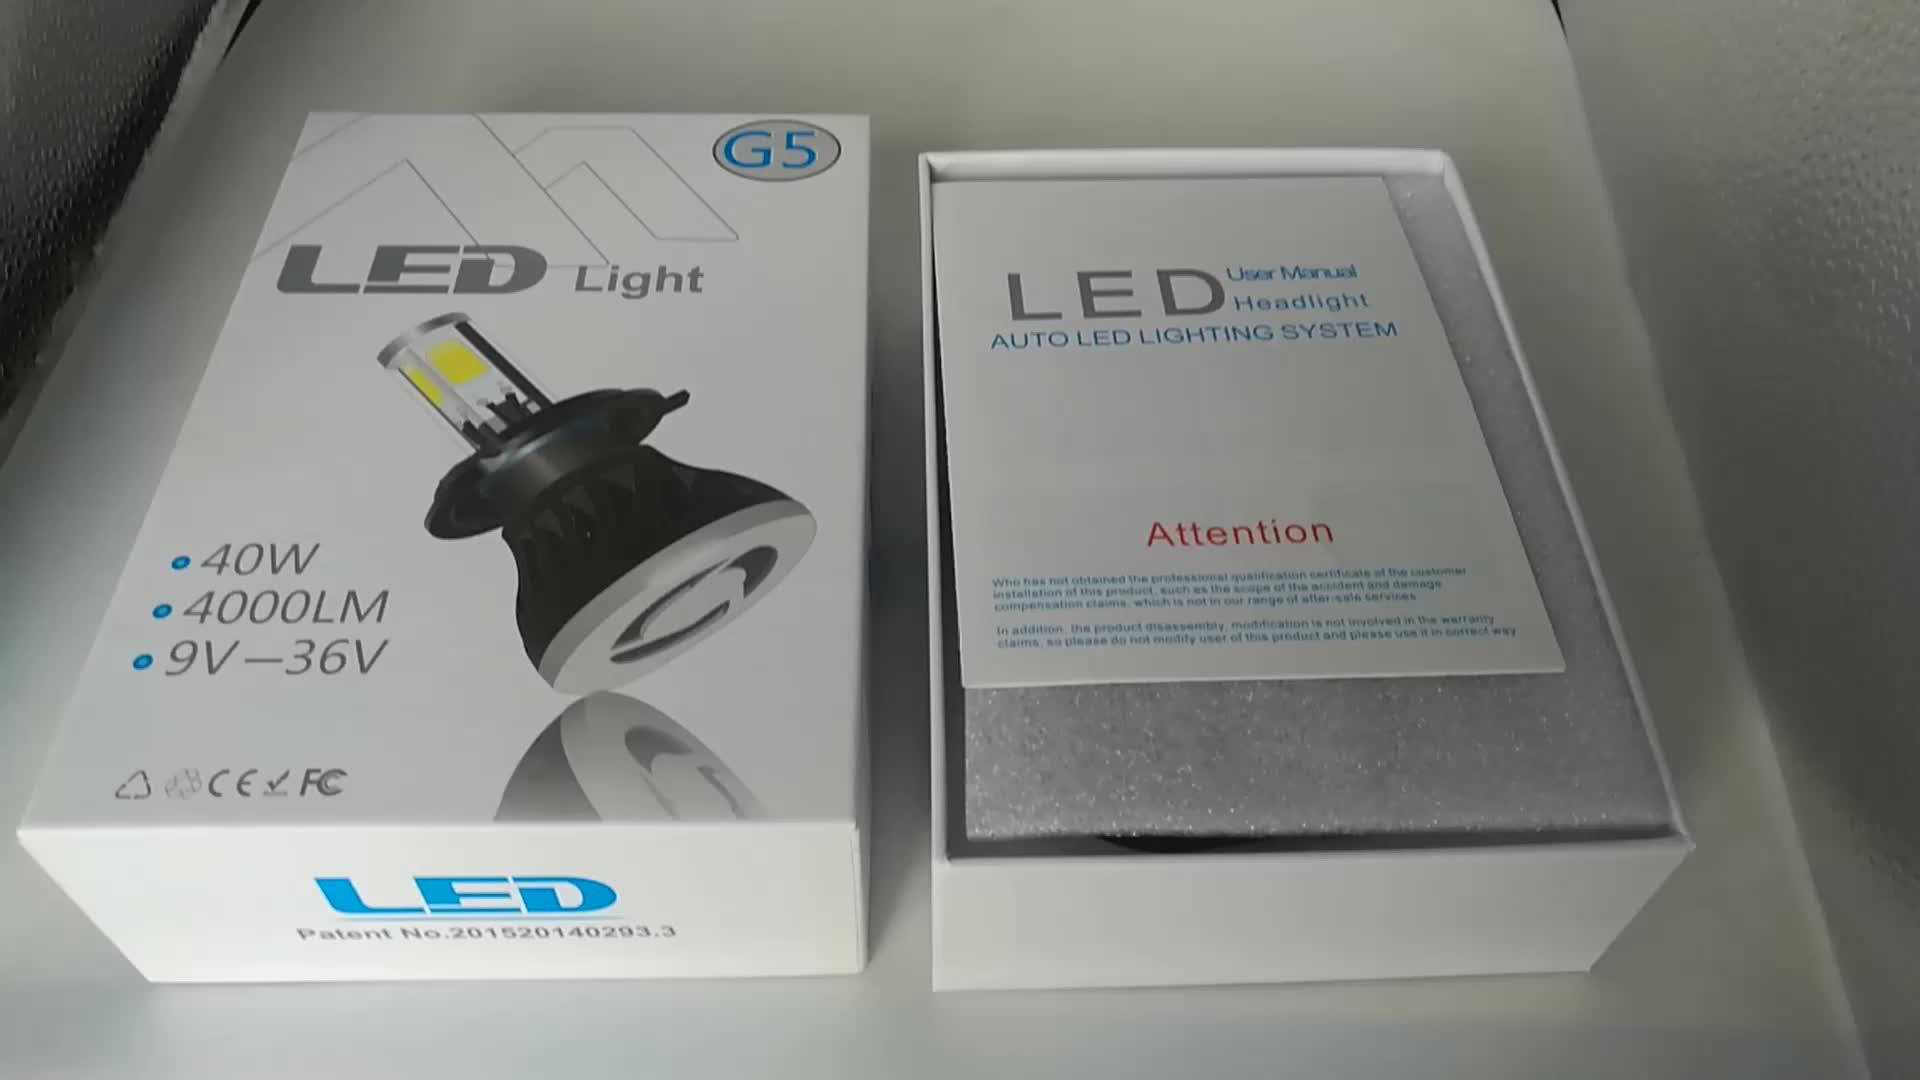 High Power G5 LED Headlight 80W 8000lm  Car LED 880 5202 H1 H7 H3 H11 Bulb LED COB Lamp Headlight